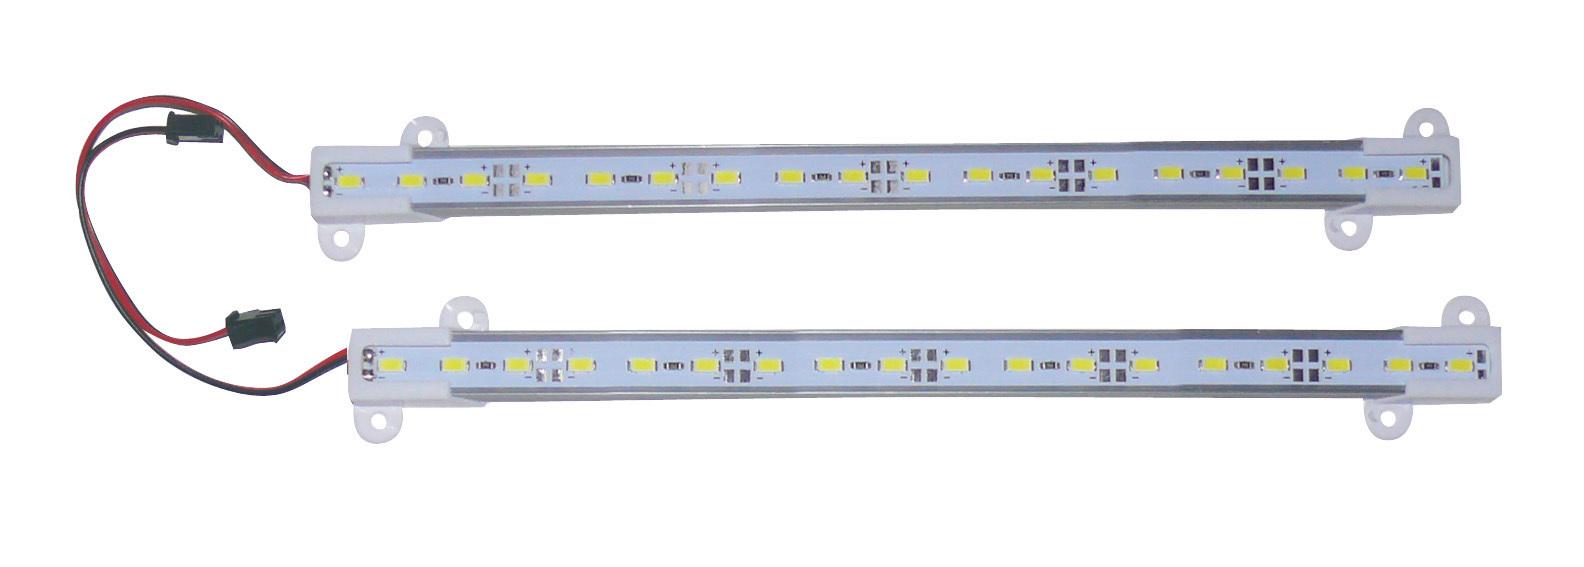 "2 10"" Utility LED Strip Lights 65101"